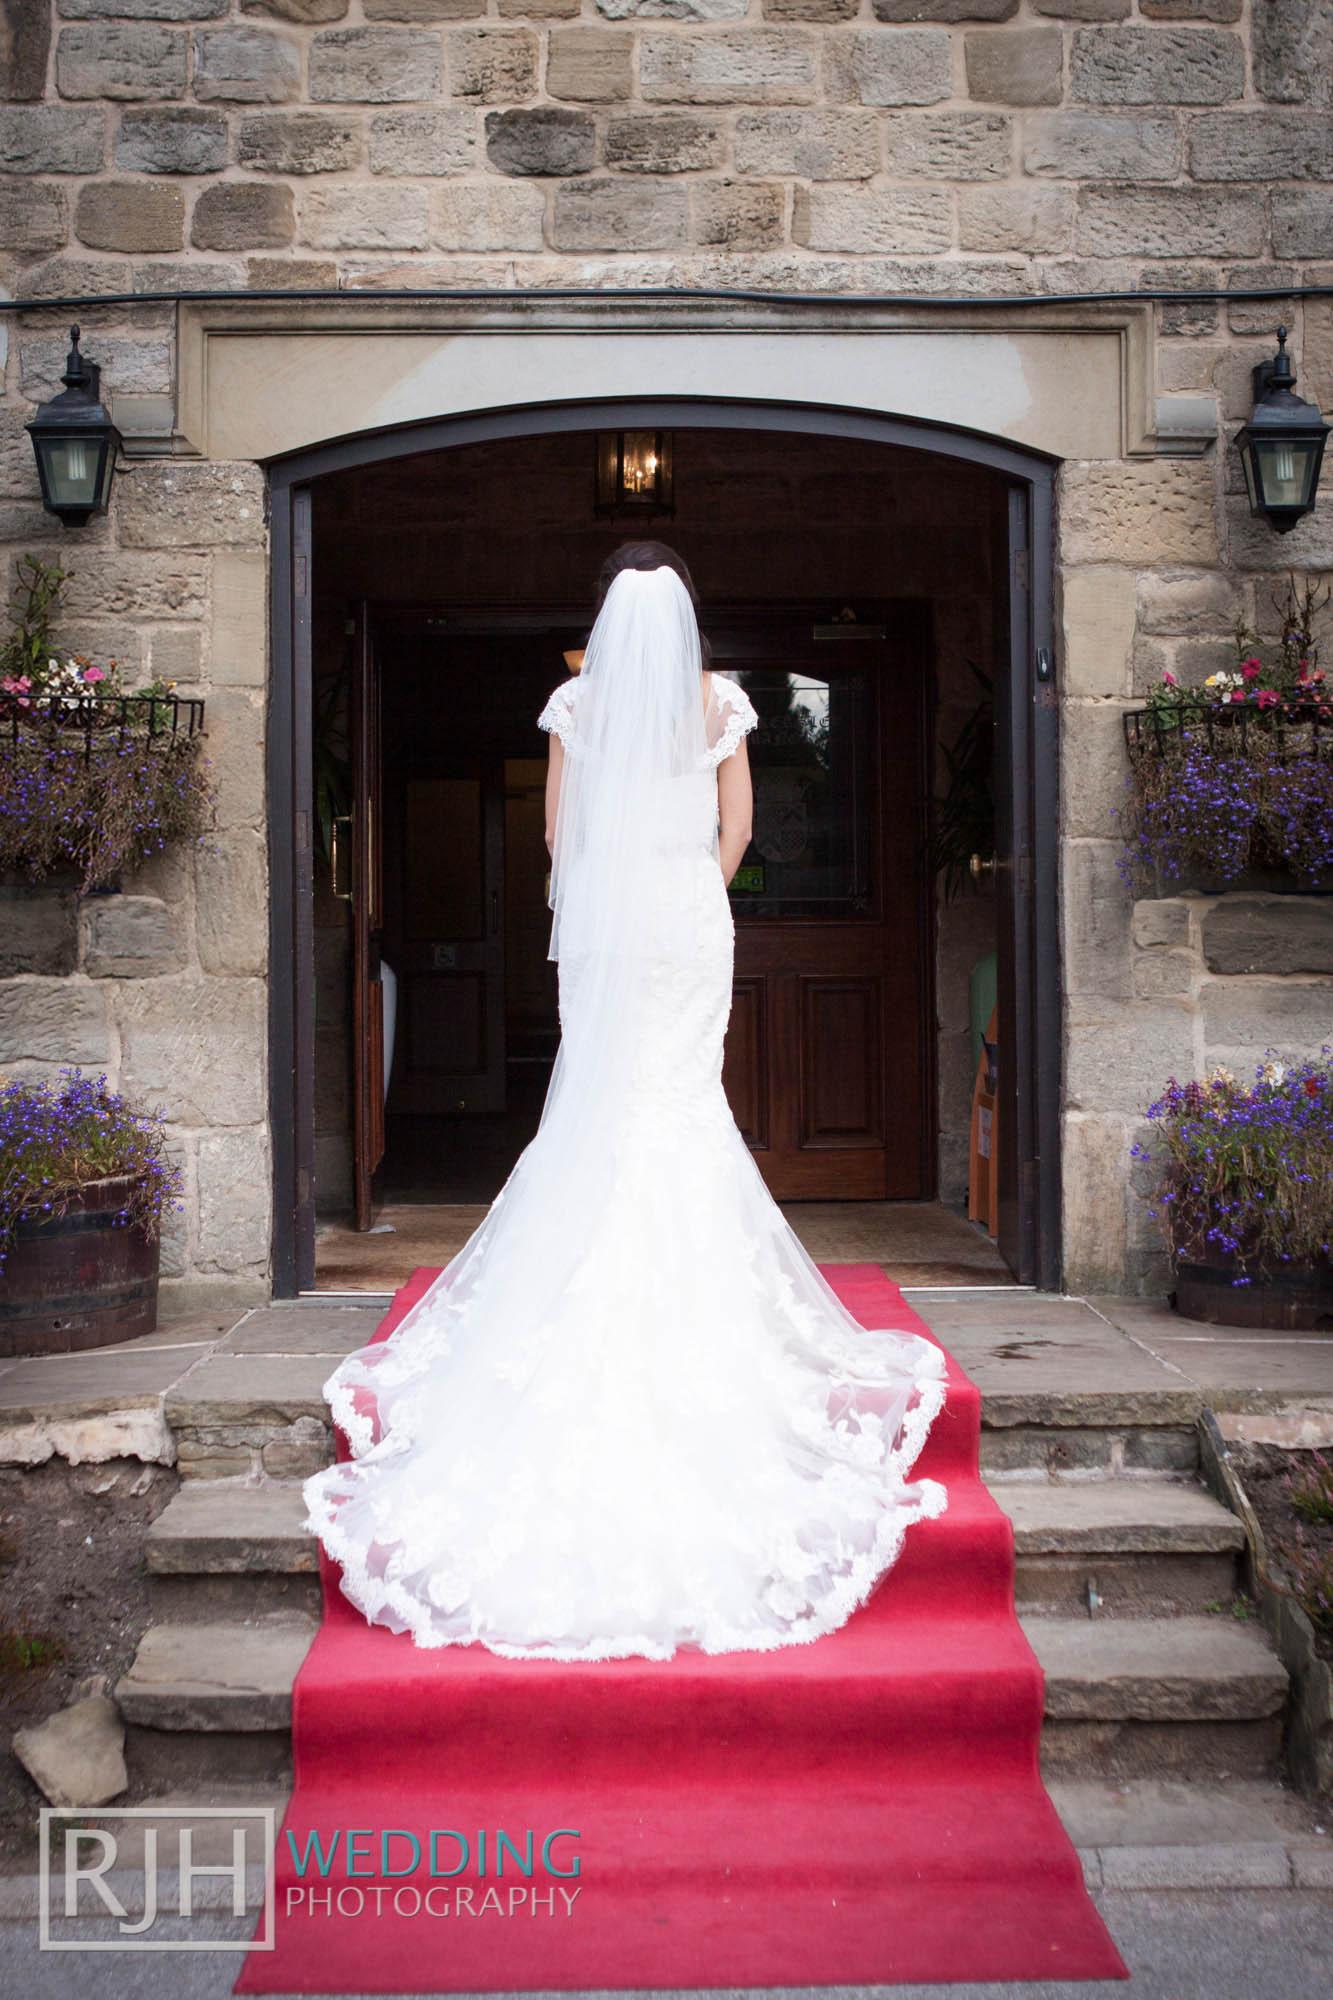 RJH Wedding Photography_Tankersley Manor Wedding_37.jpg